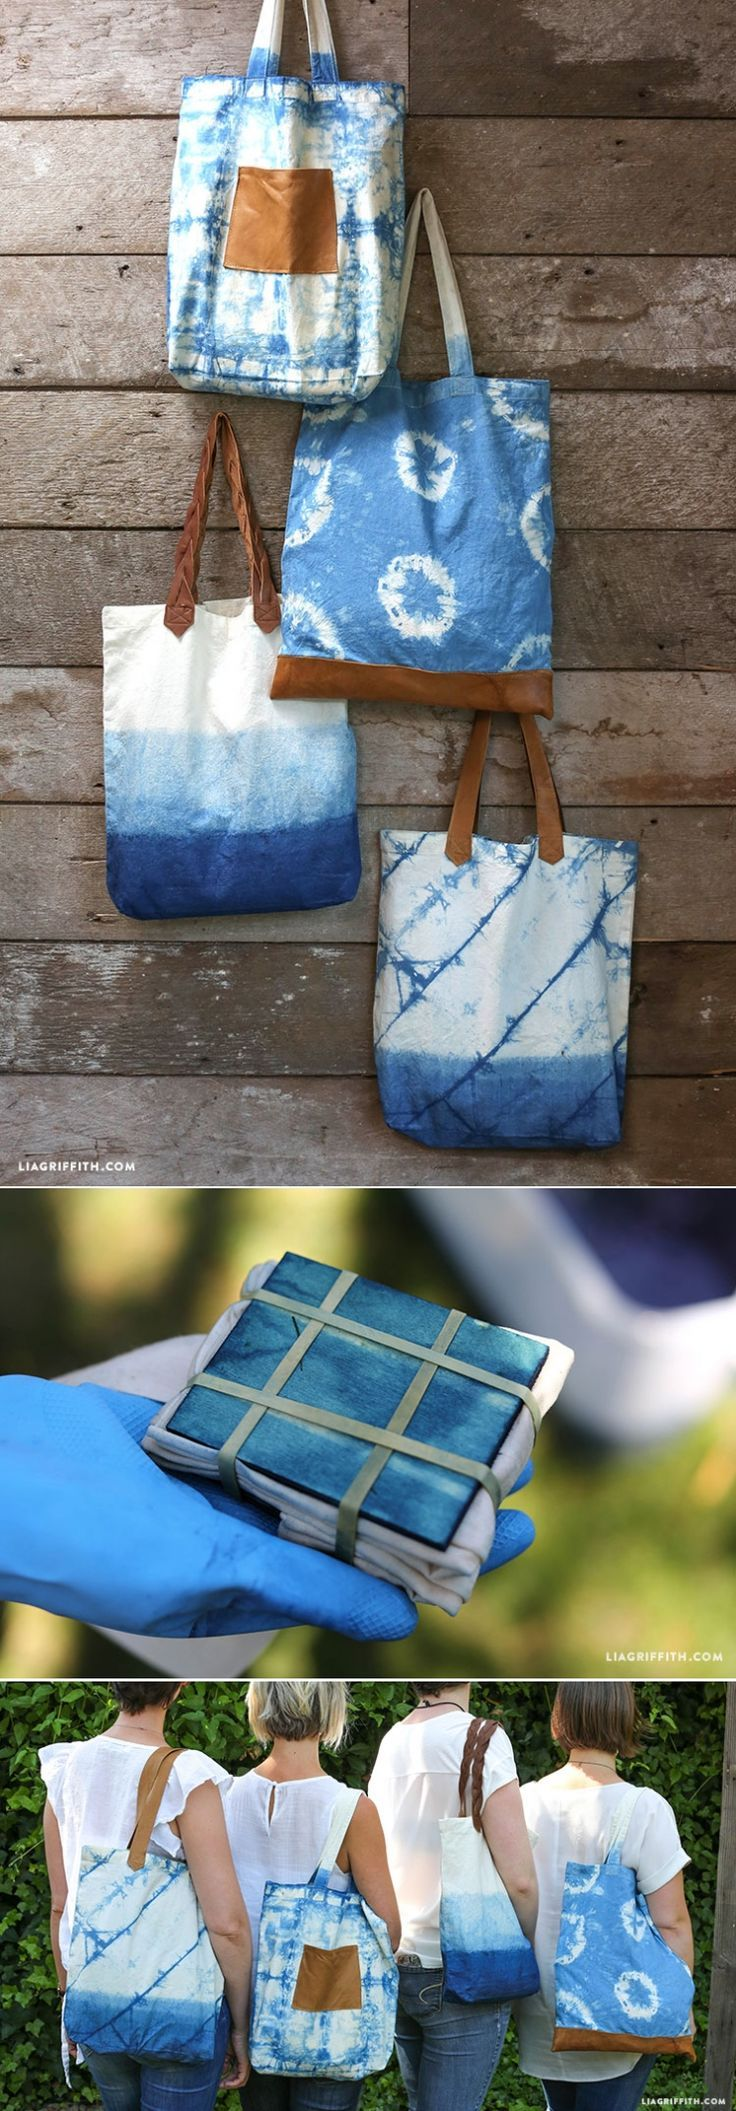 Tote bags dyed with indigo using tie dye & shibori techniques   Lia Griffith